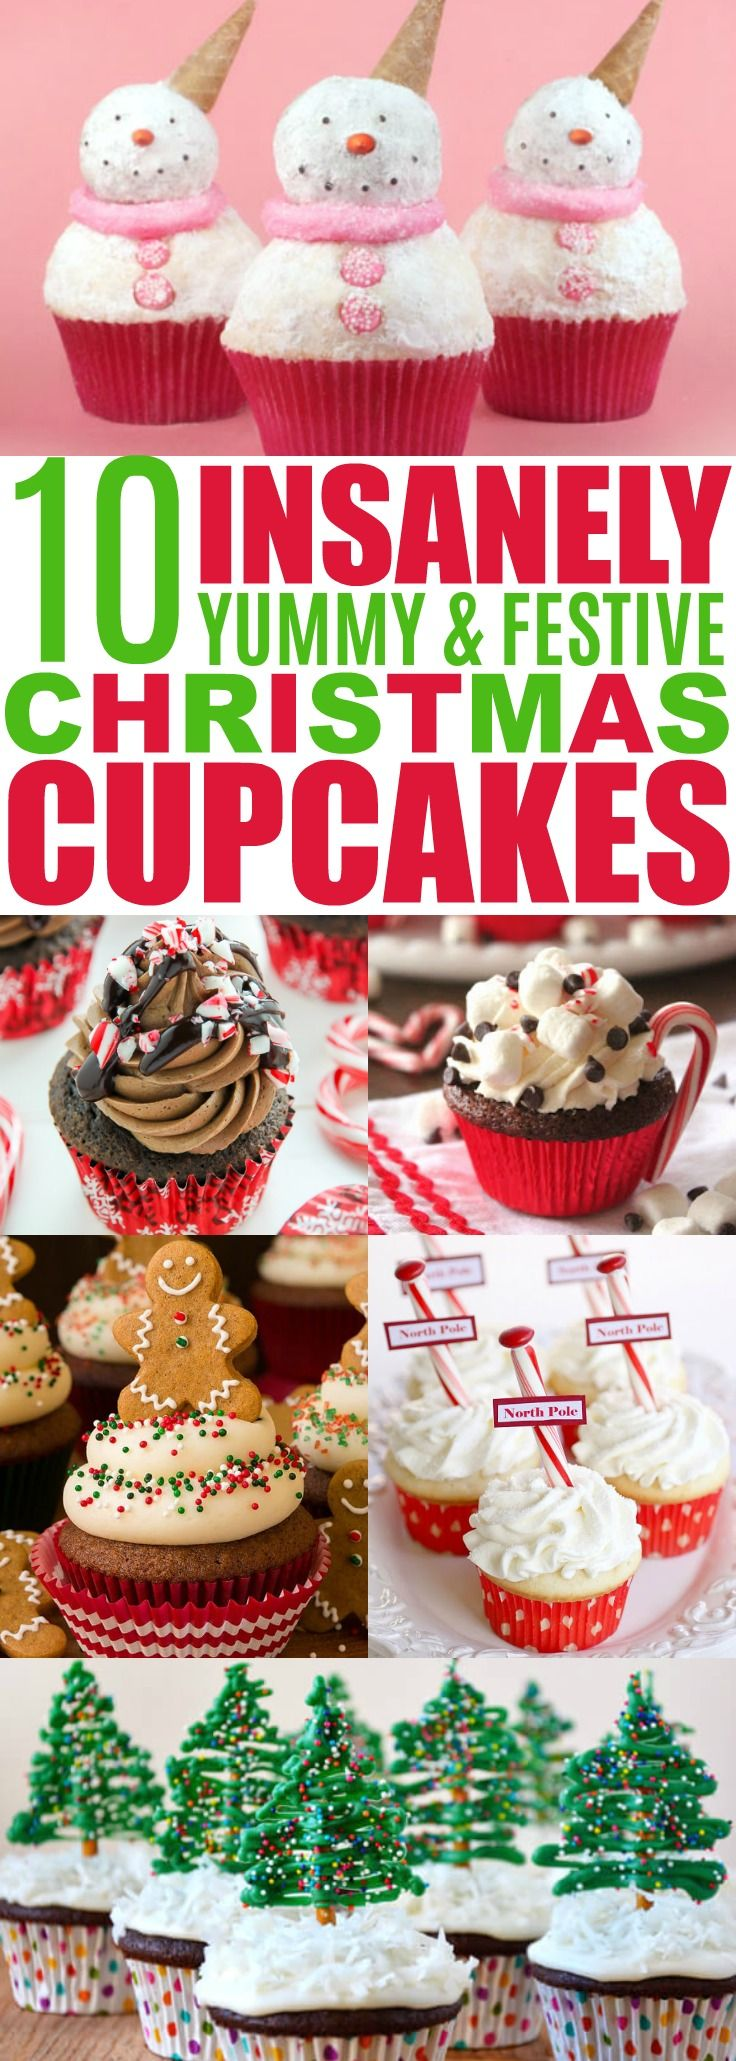 Christmas Cupcake Recipes, Holiday Cupcake Ideas, Decorating Christmas Cupcakes